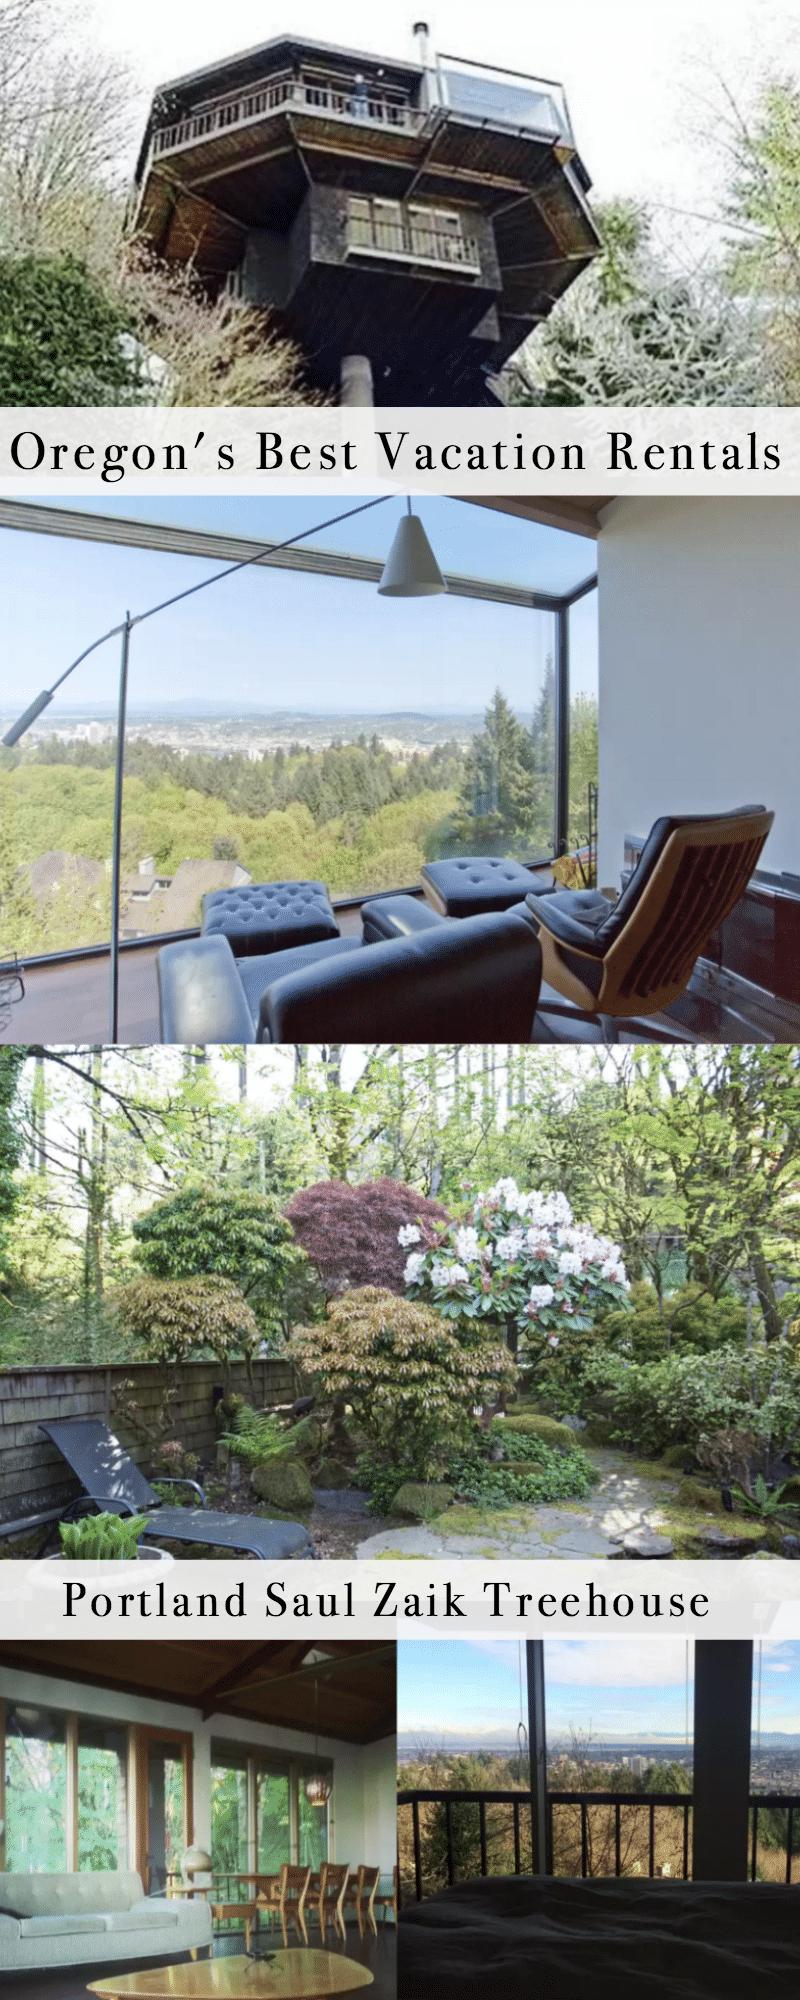 Oregon's Best Vacation Rentals: Portland Treehouse